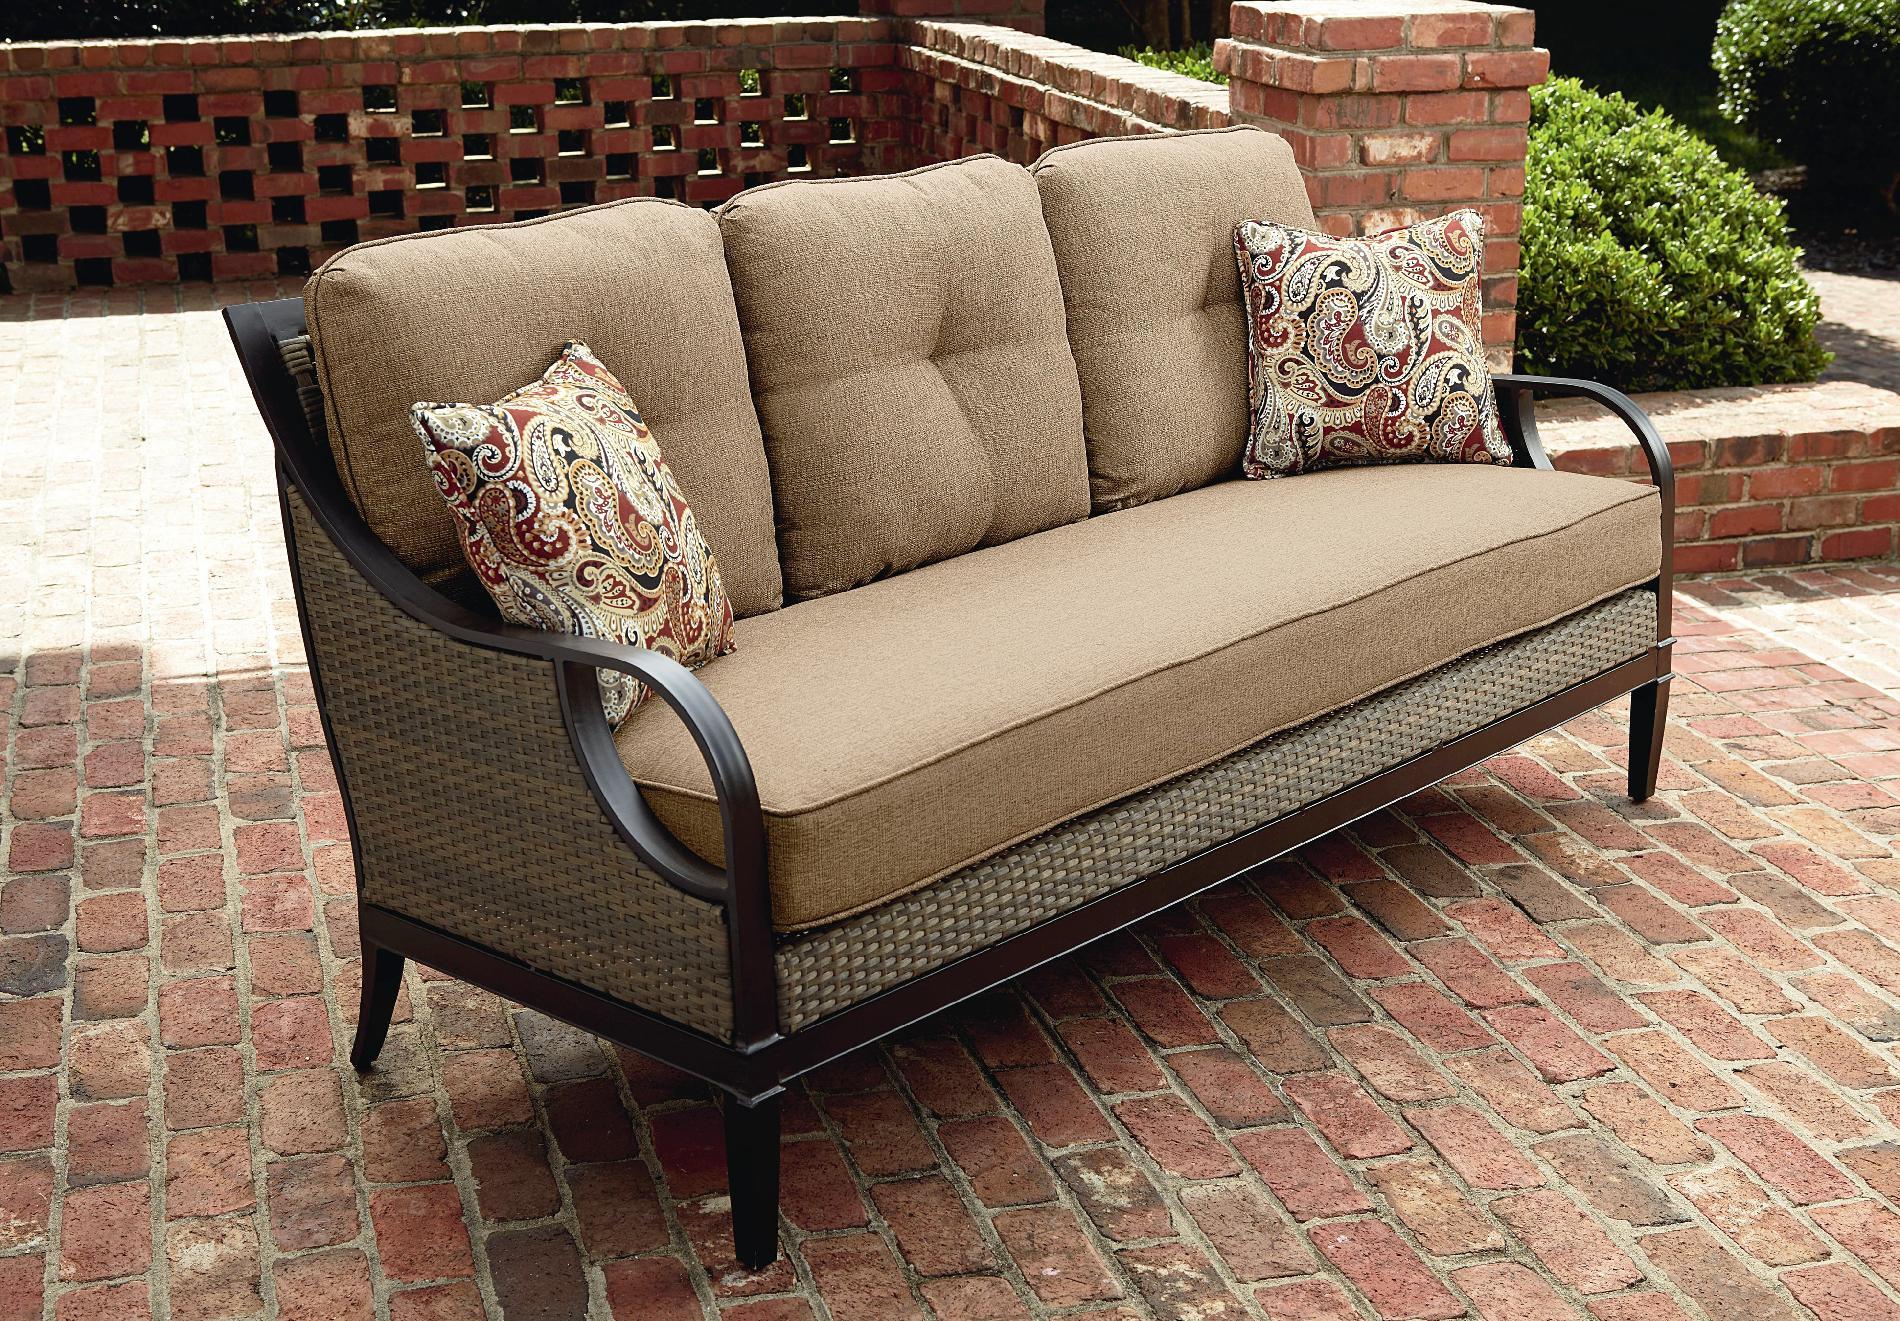 outdoor sofa furniture flexsteel sleepers replacement cushions